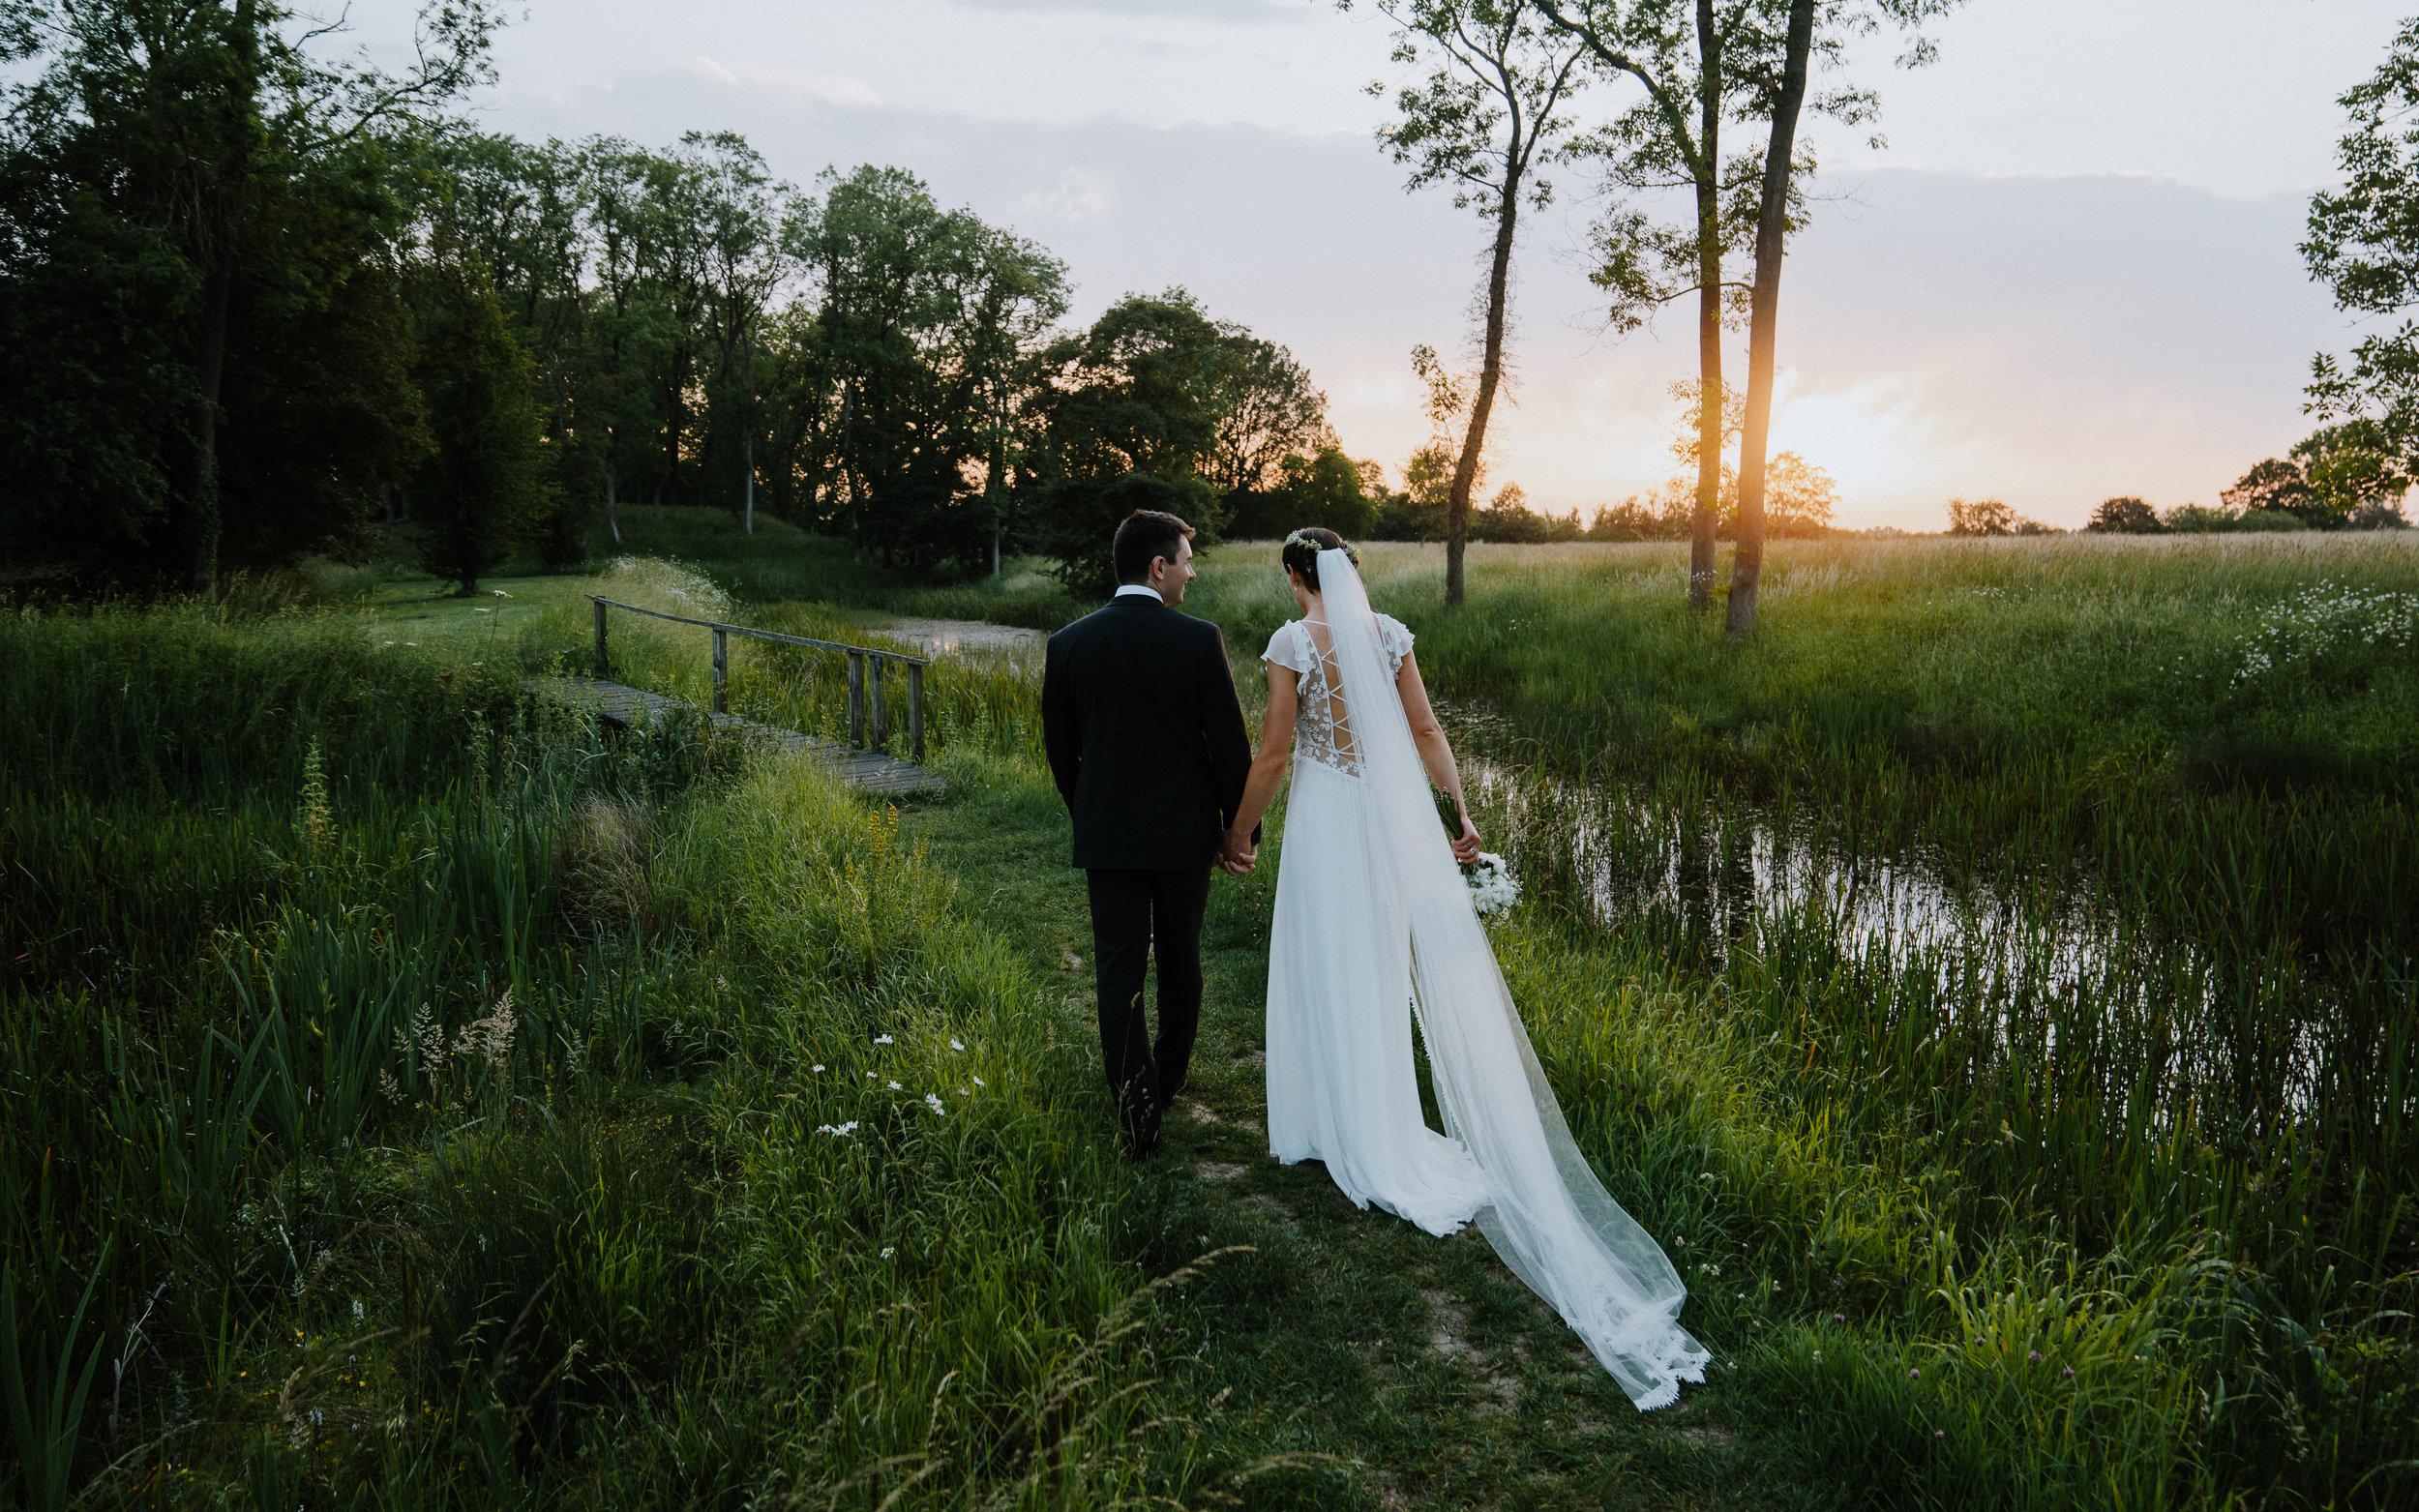 SALLY & HUGH - BEAUTIFUL SUMMER WEDDING IN OUNDLE, england